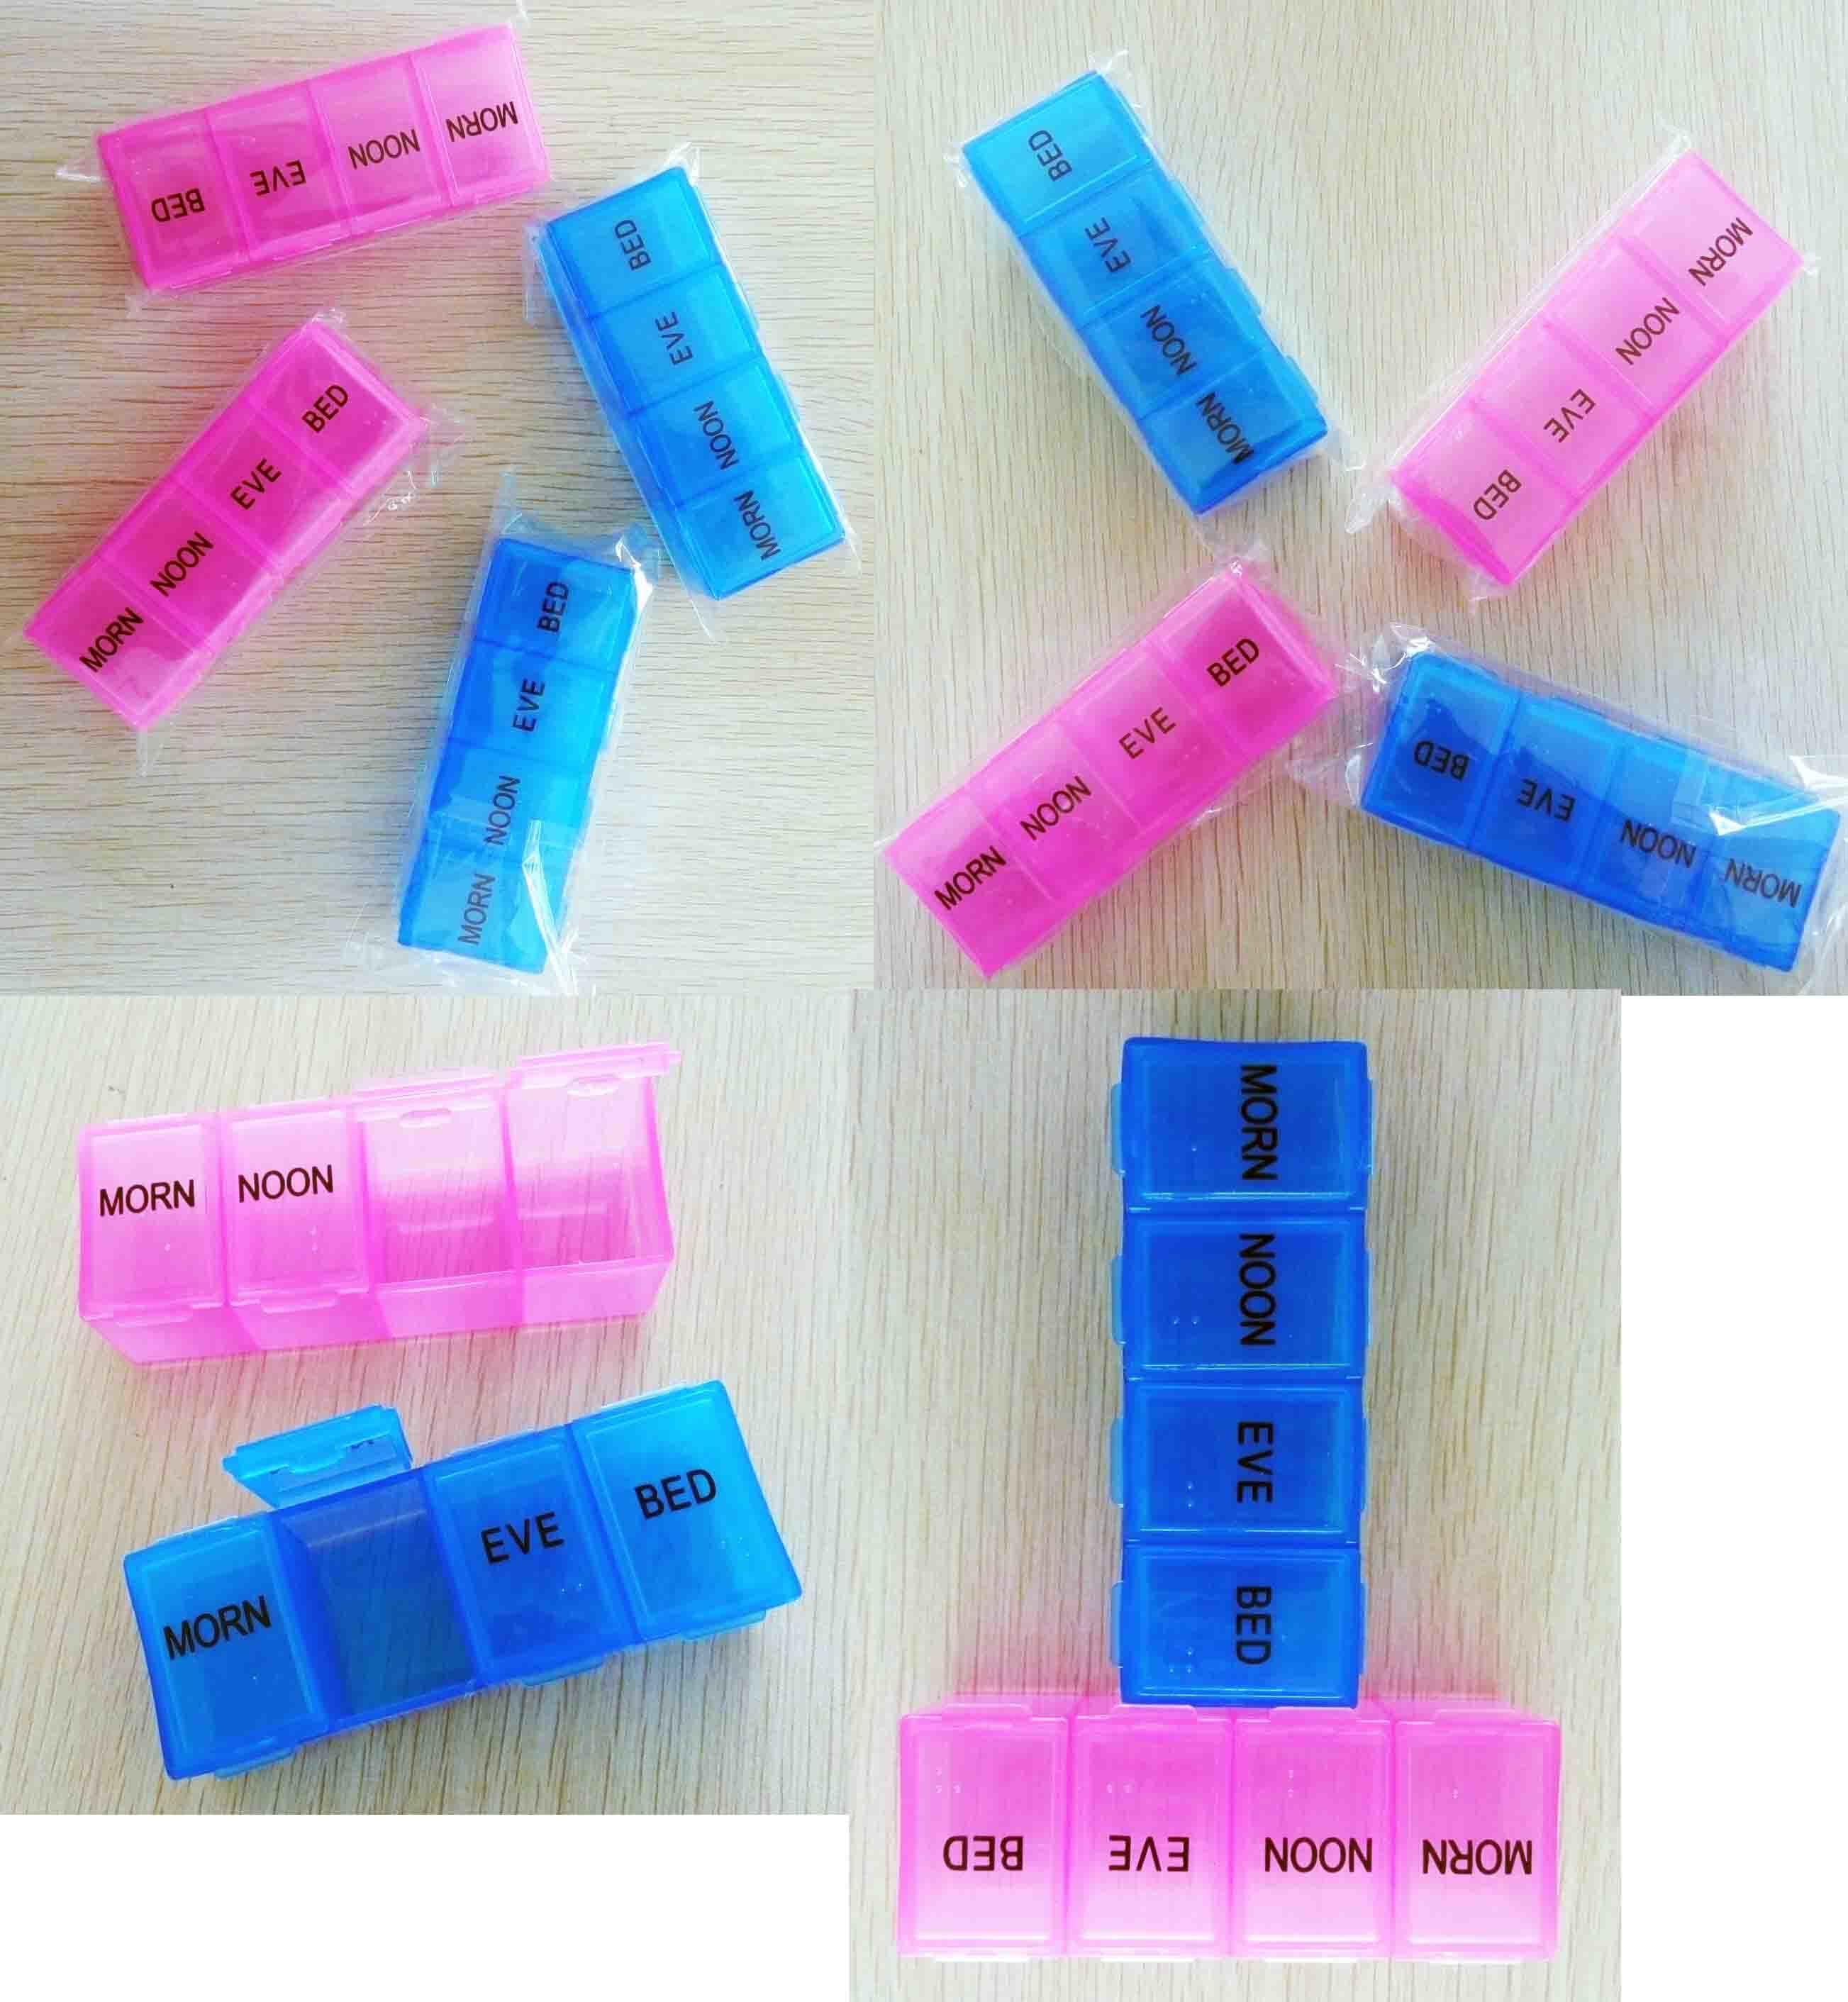 Travel 7 Day Pill Box Plastic Medicine Box Stationery